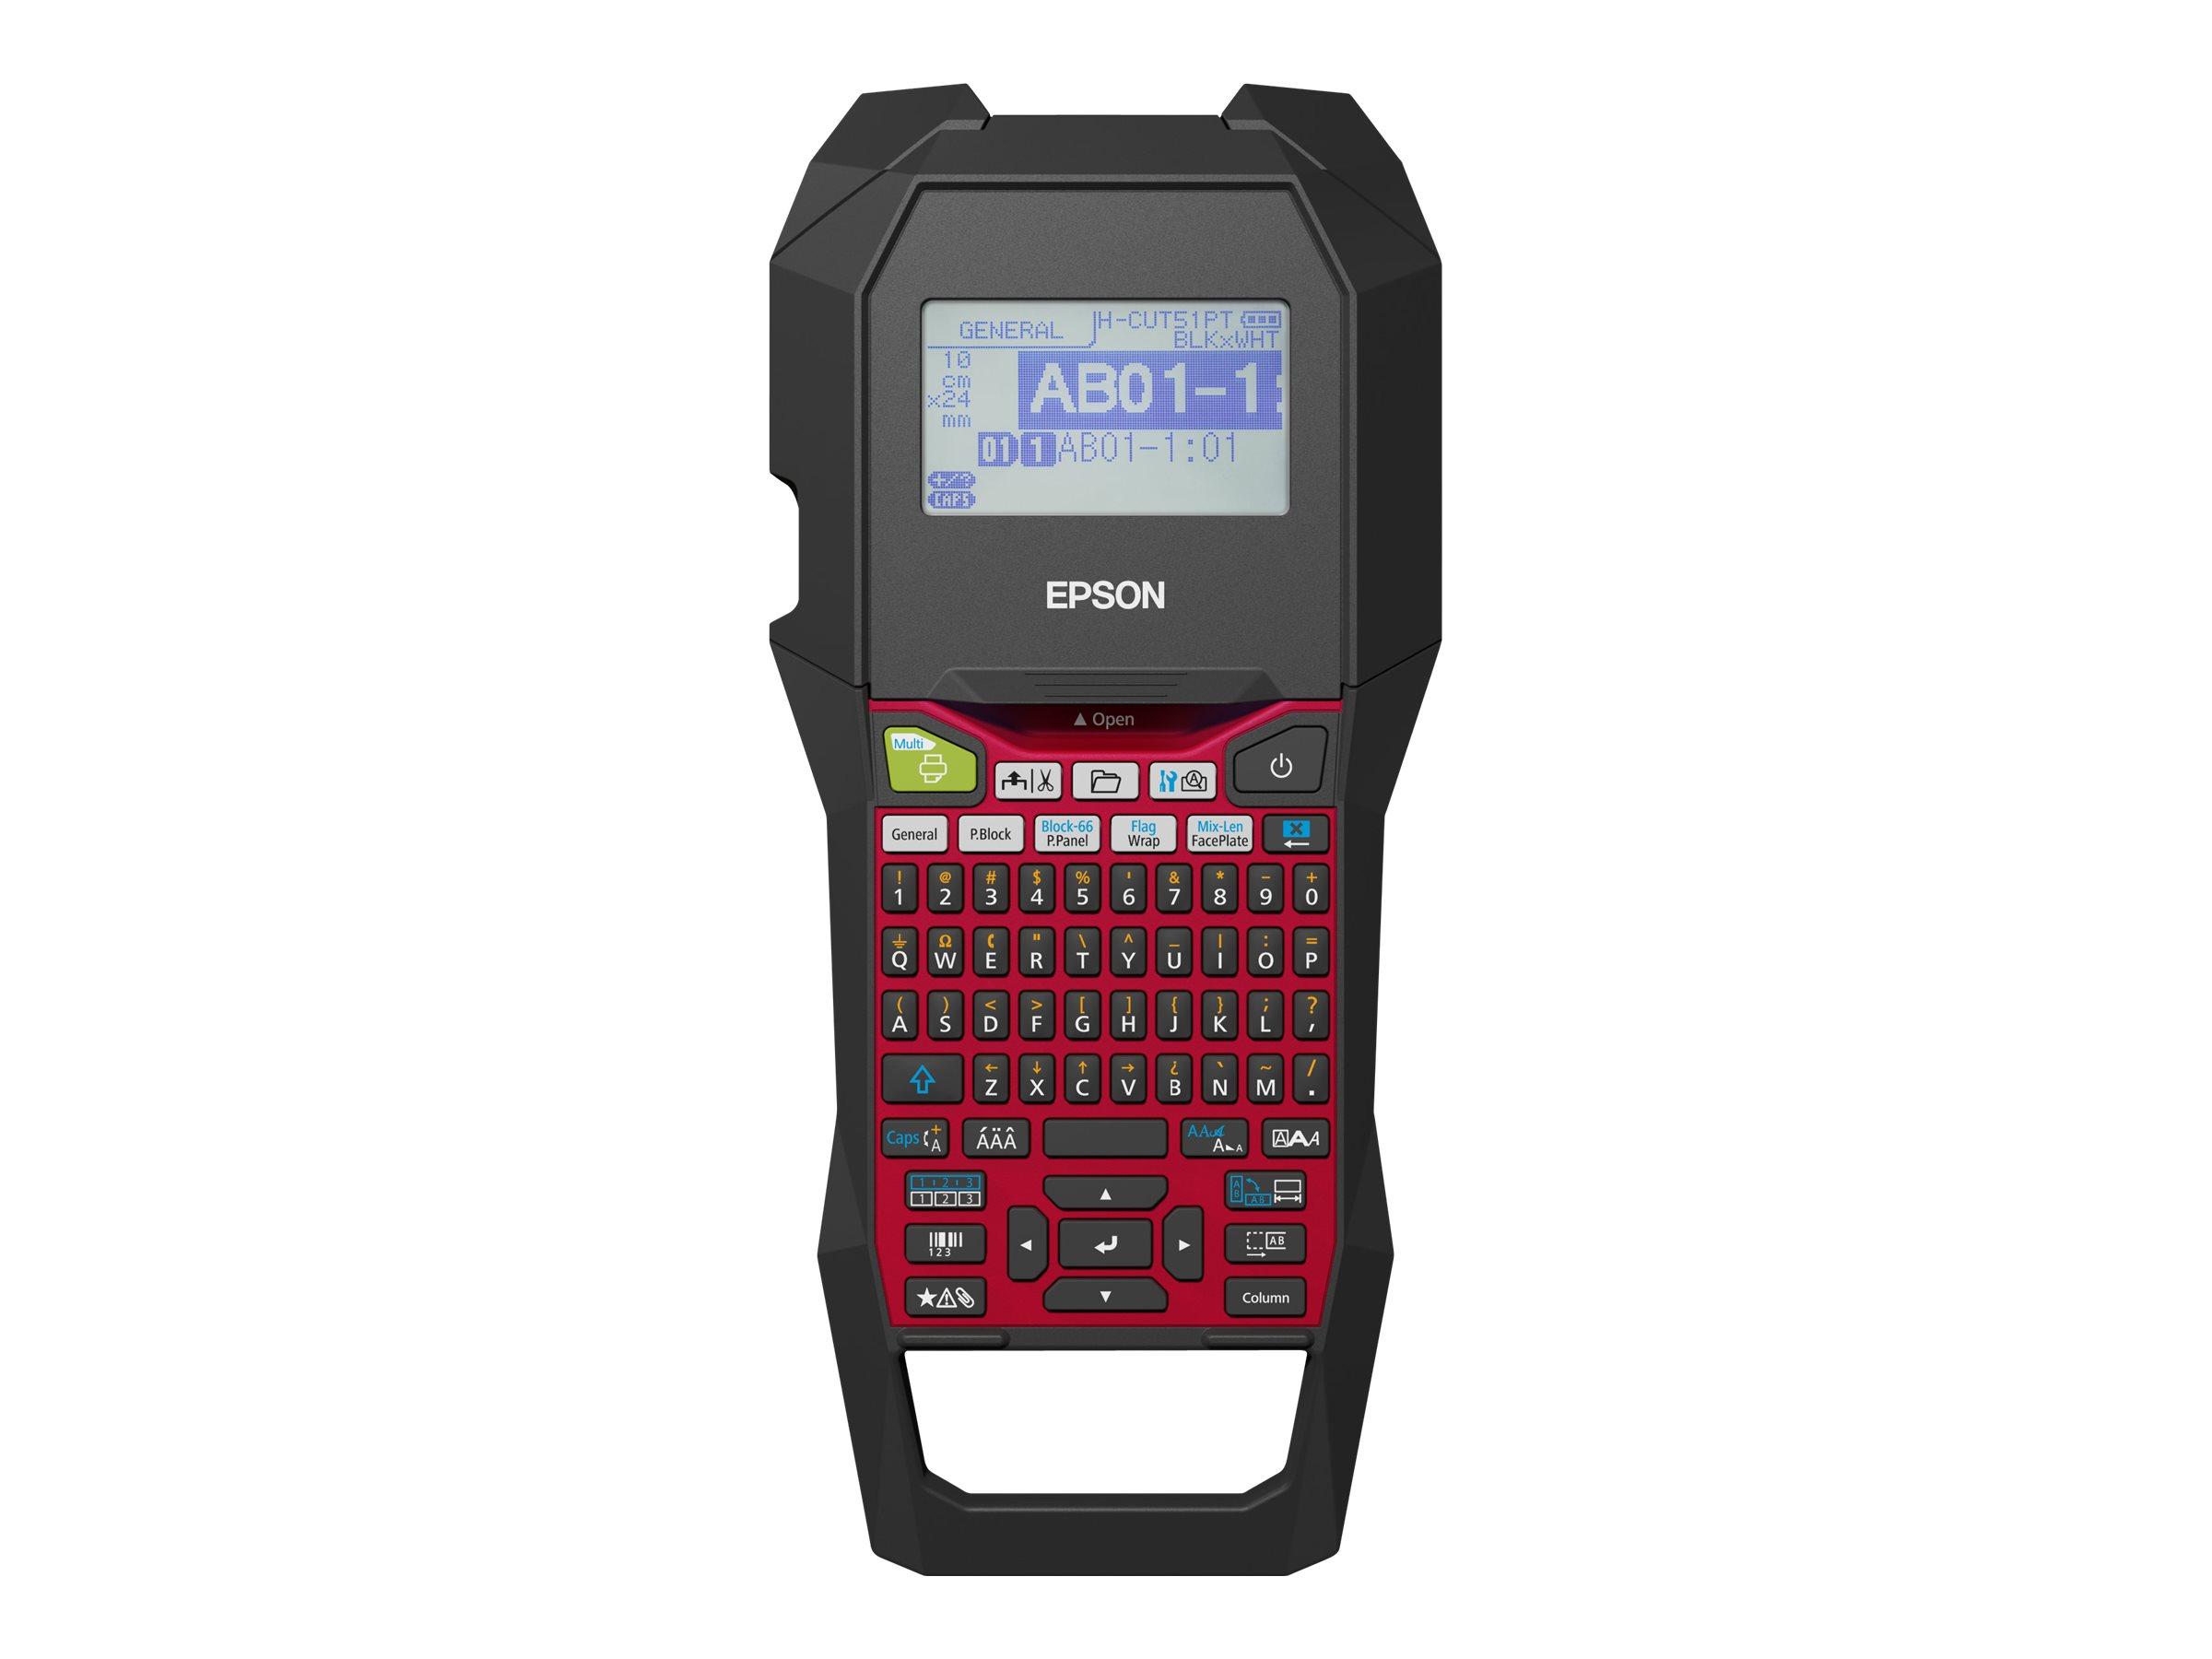 Epson LabelWorks LW-Z700FK - Beschriftungsgerät - s/w - Thermotransfer - Rolle (2,4 cm) - 180 dpi